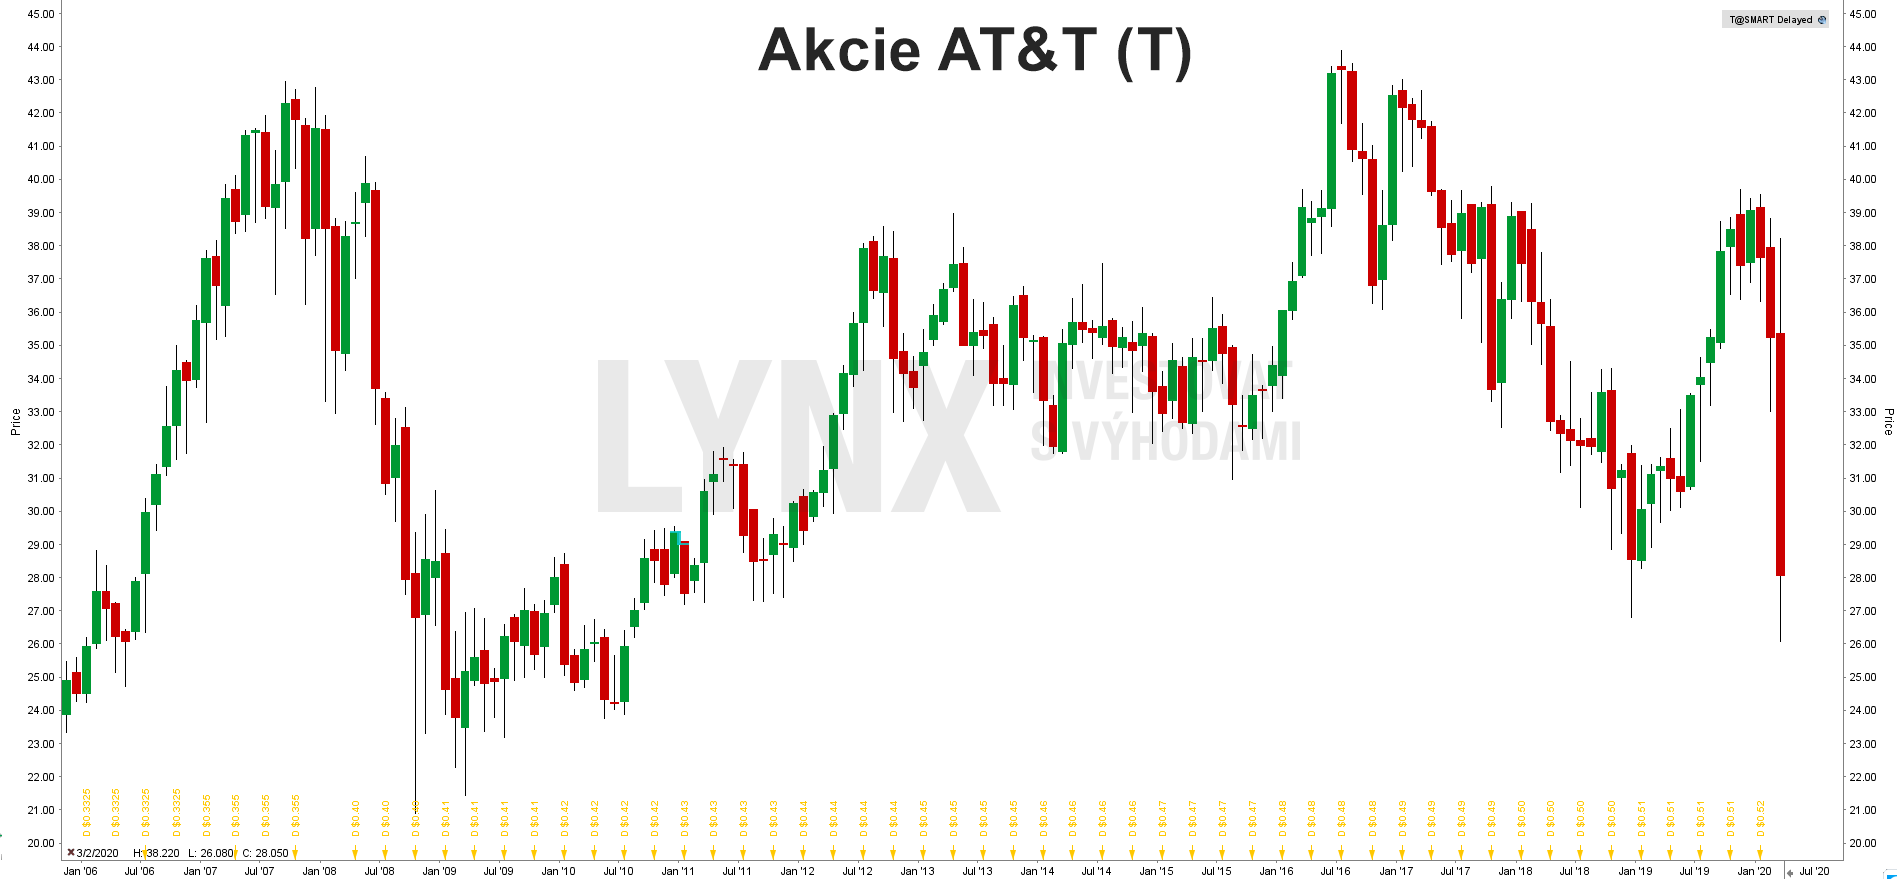 Graf: Akcie AT&T